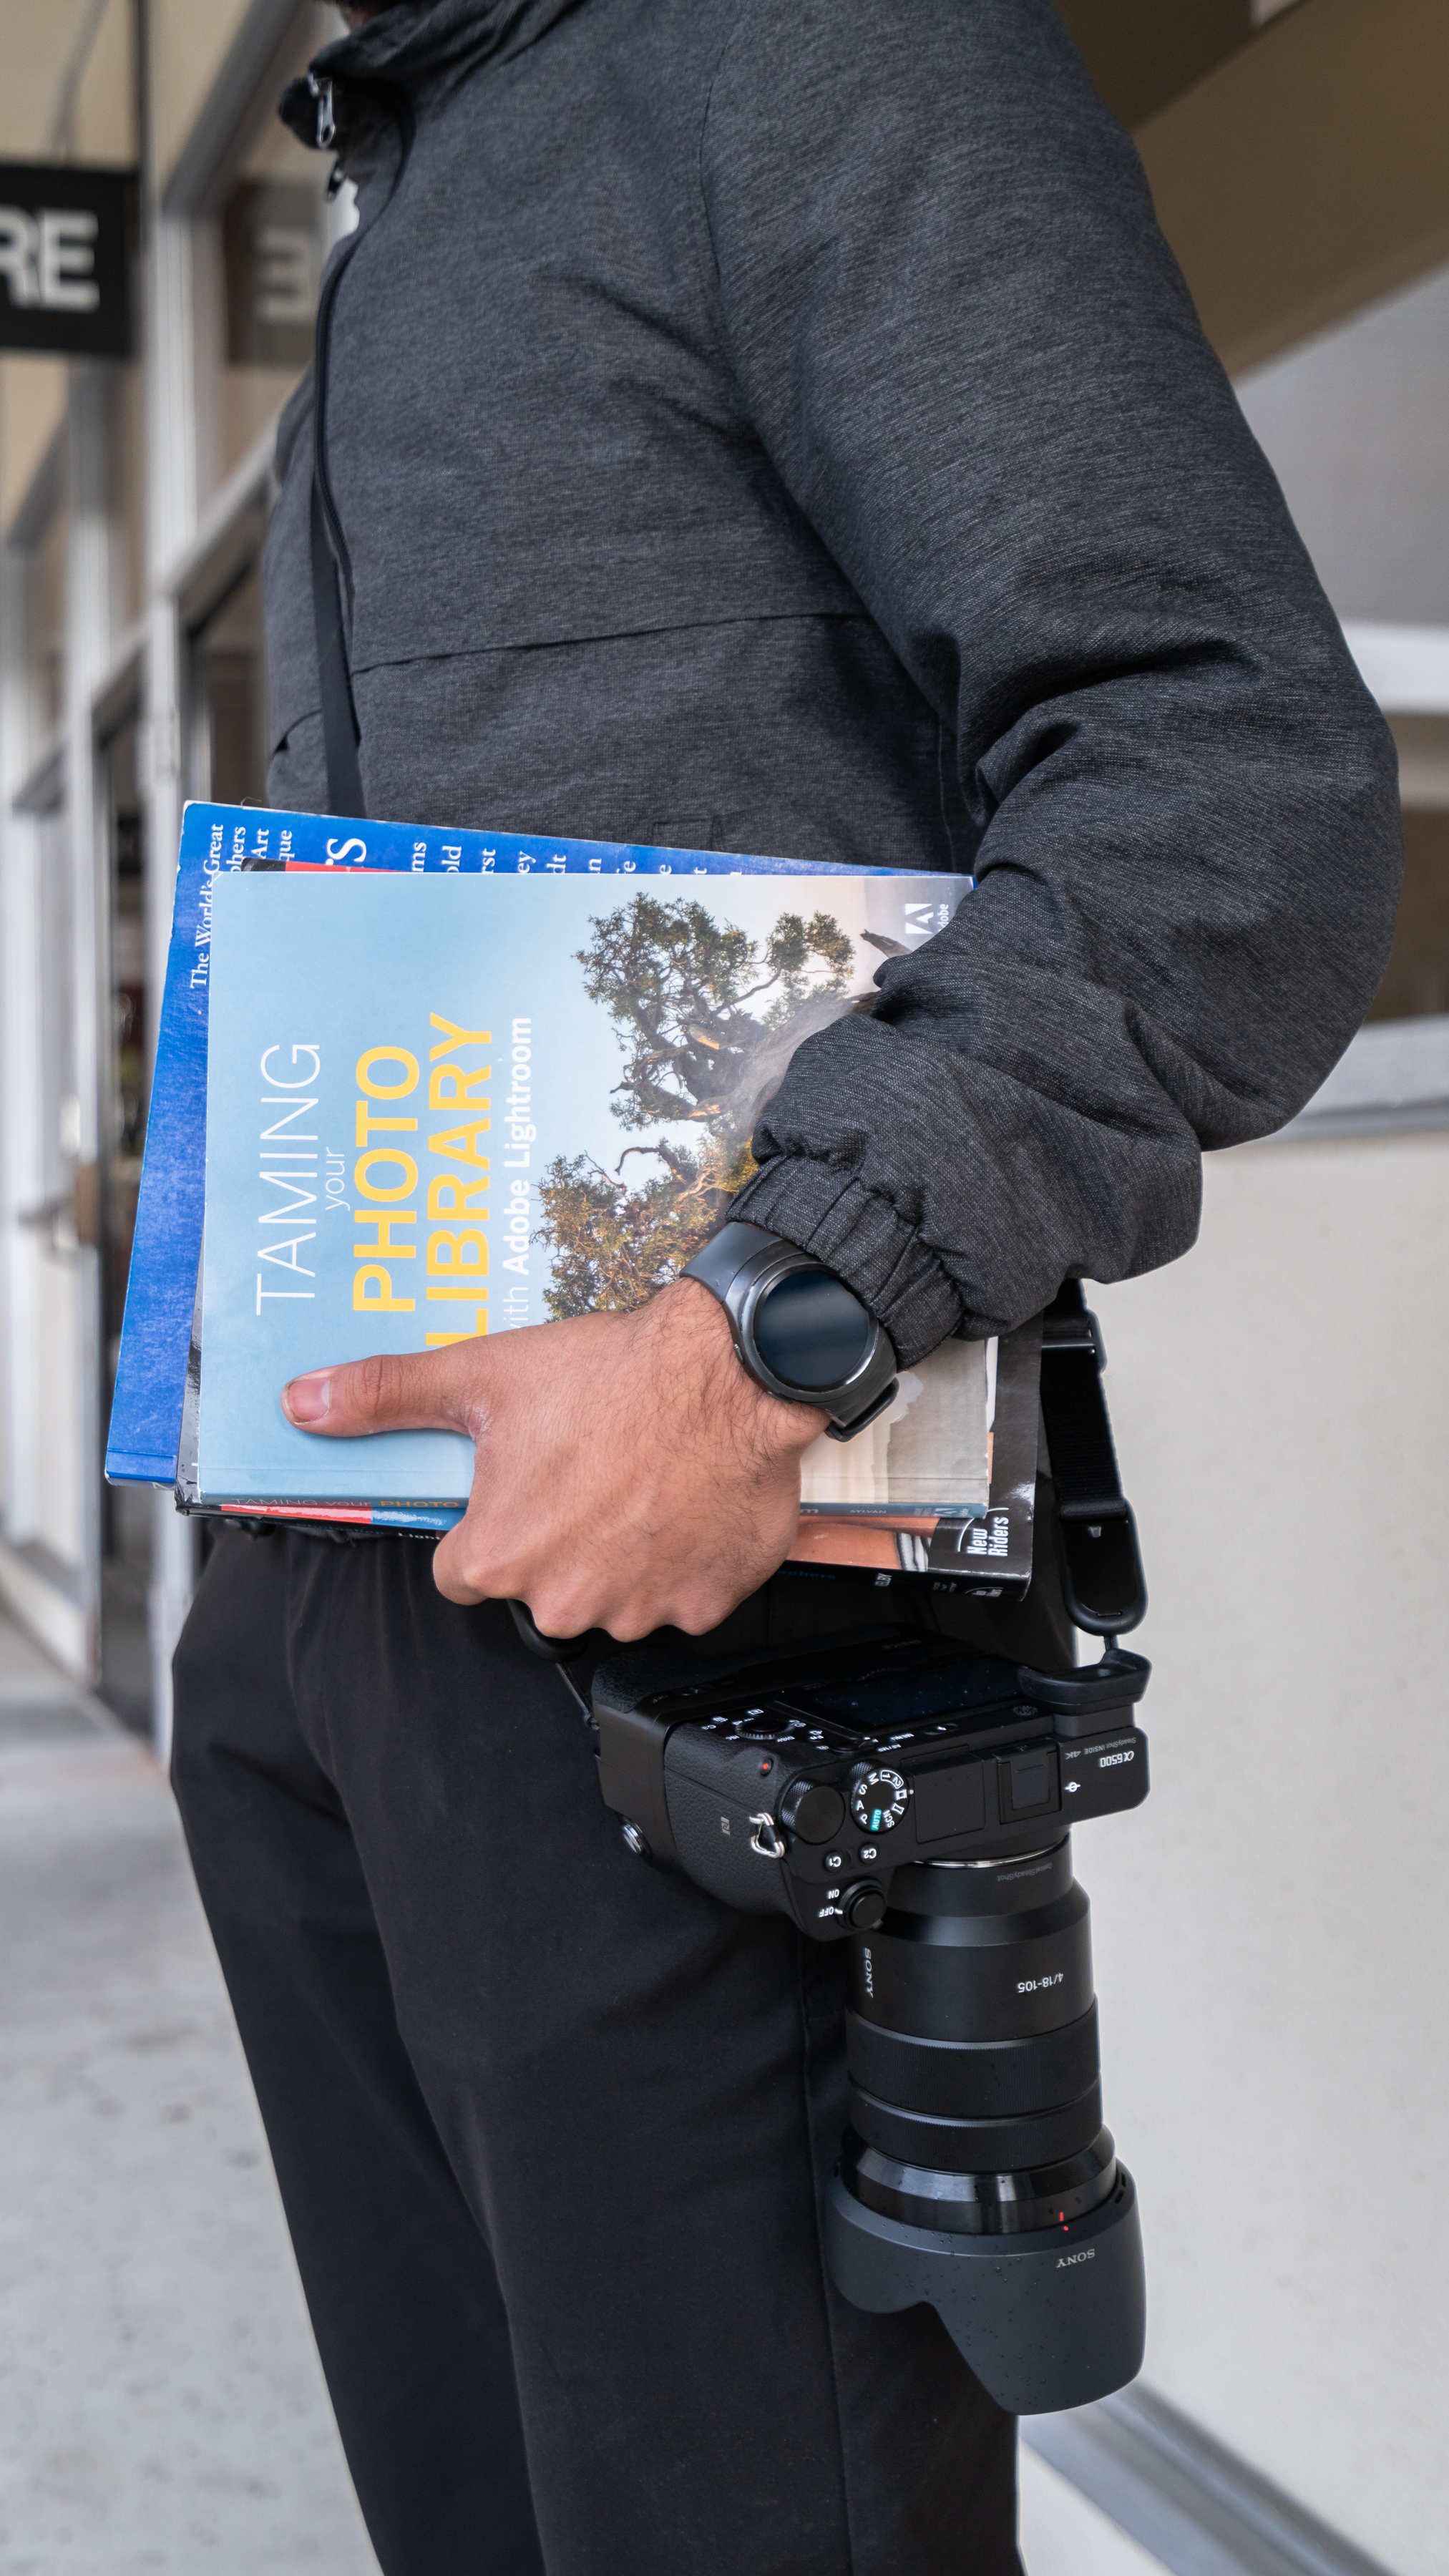 Jason Hernandez holding textbooks